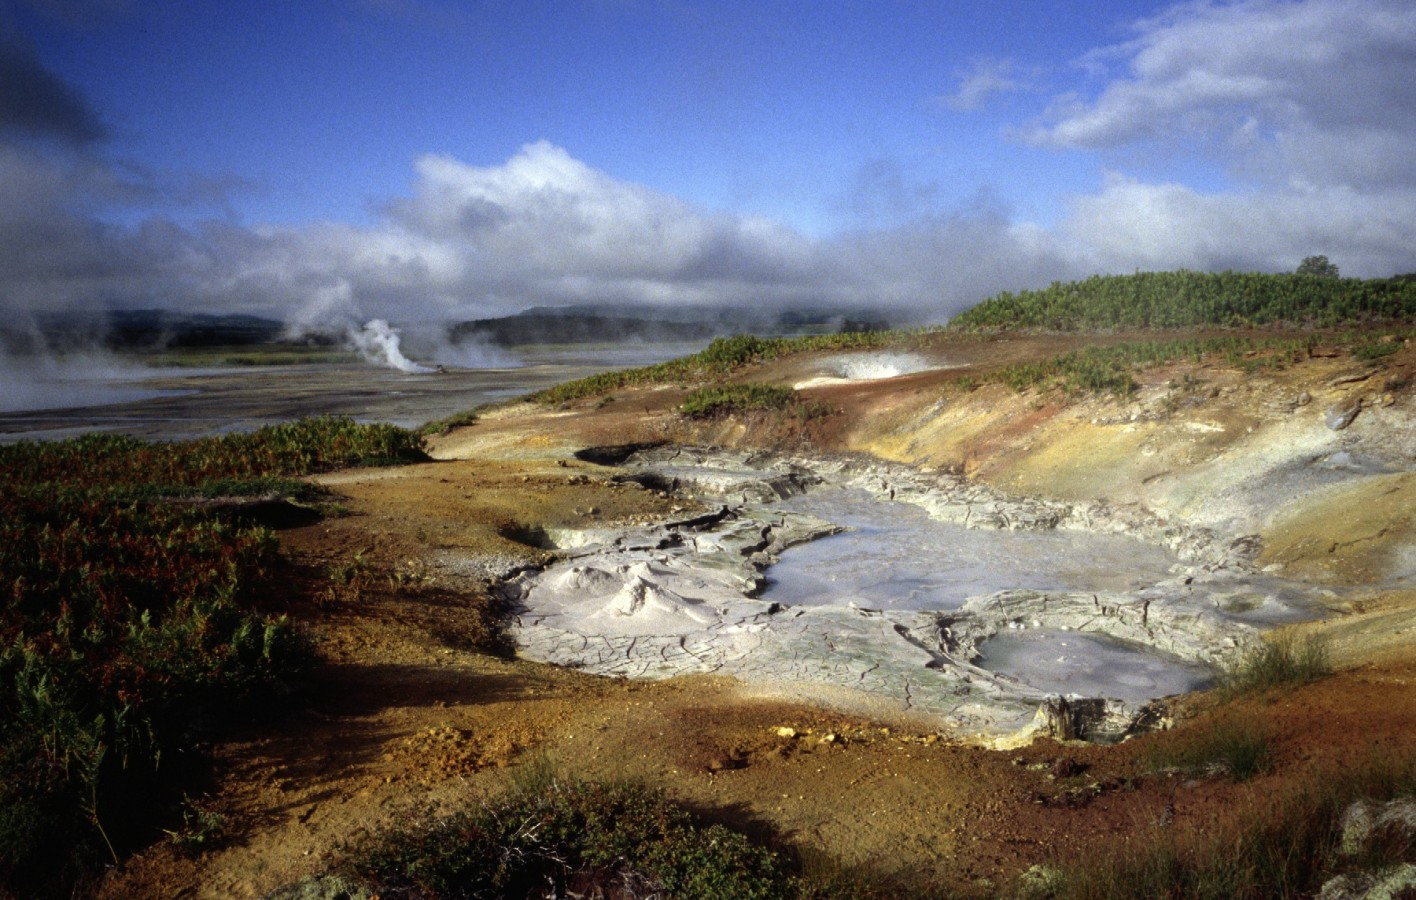 Uzon Kaldera, Kamshatka